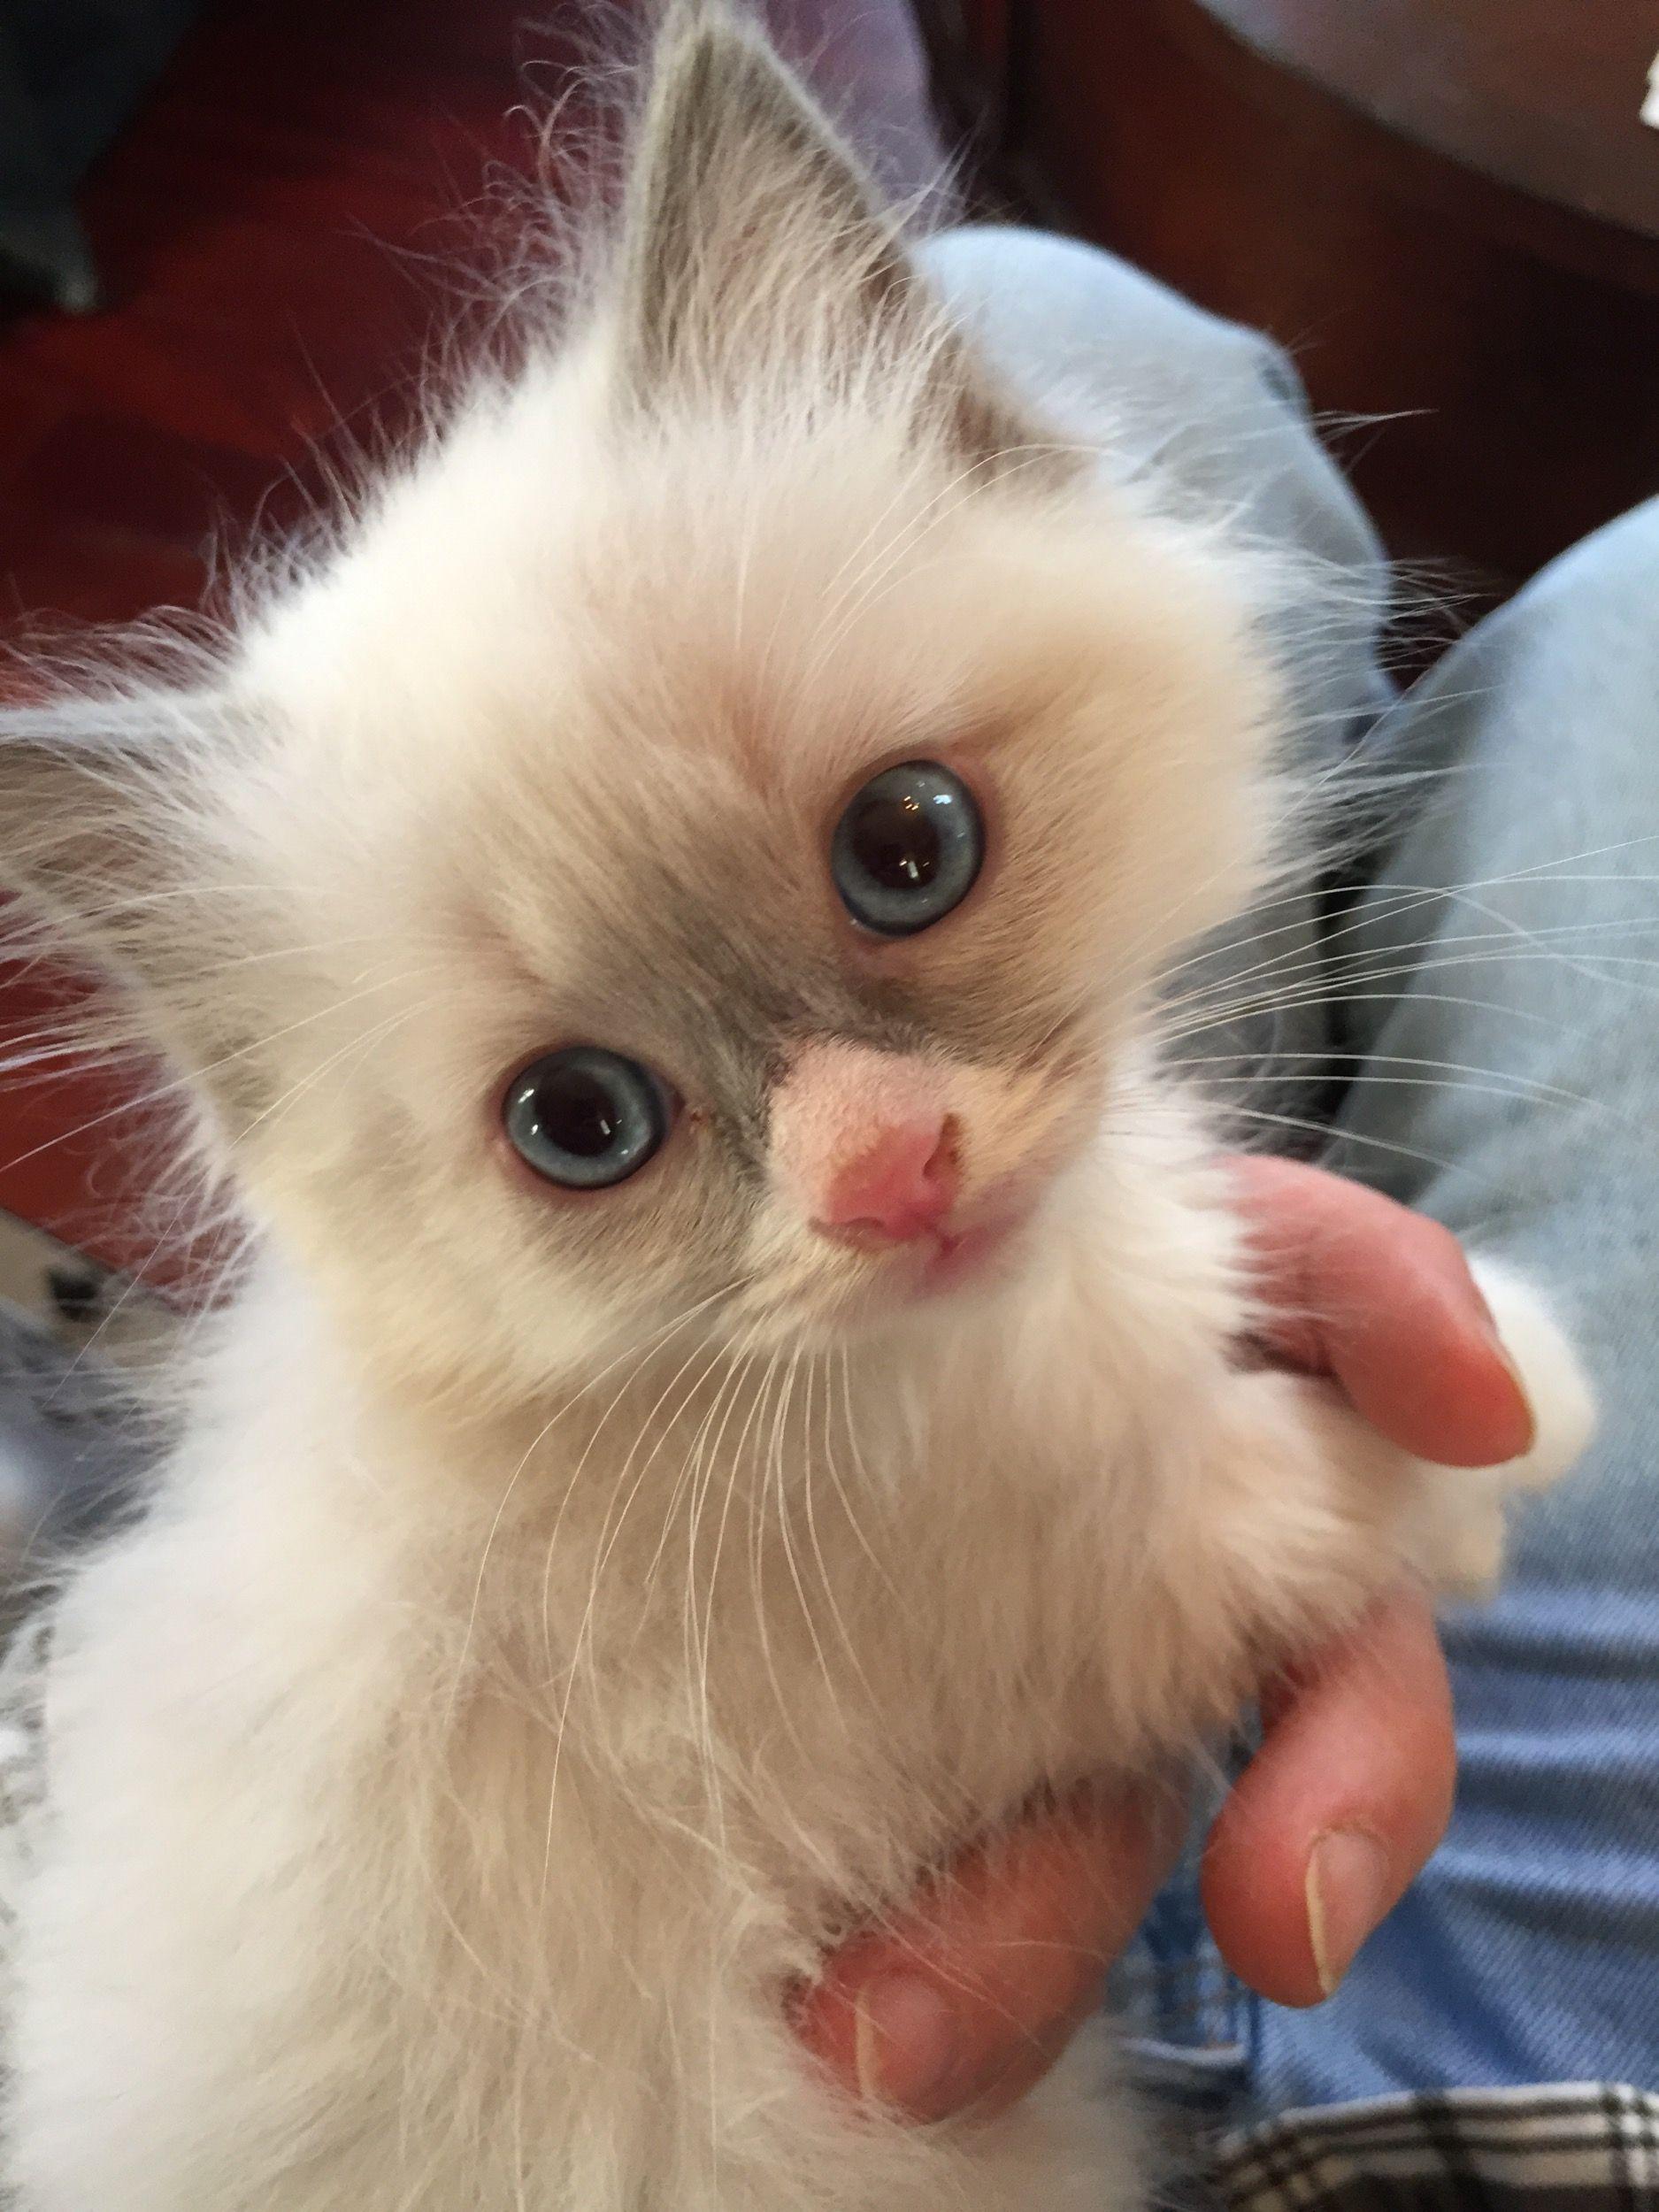 ragdoll kittens - Google Search